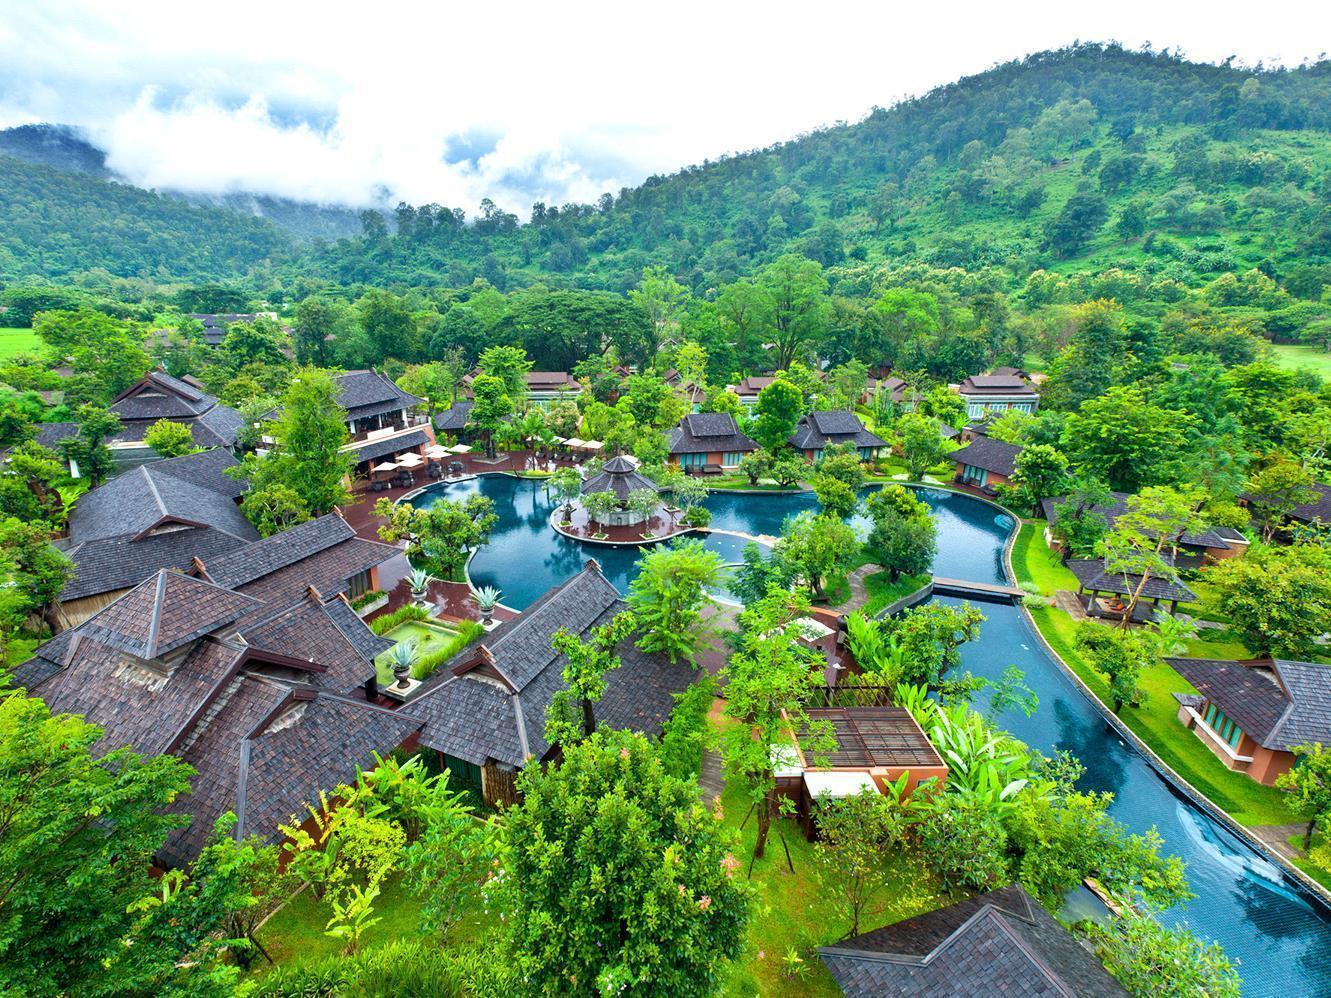 Sibsan Resort & Spa, Maetaeng สิบแสน รีสอร์ต แอนด์ สปา แม่แตง